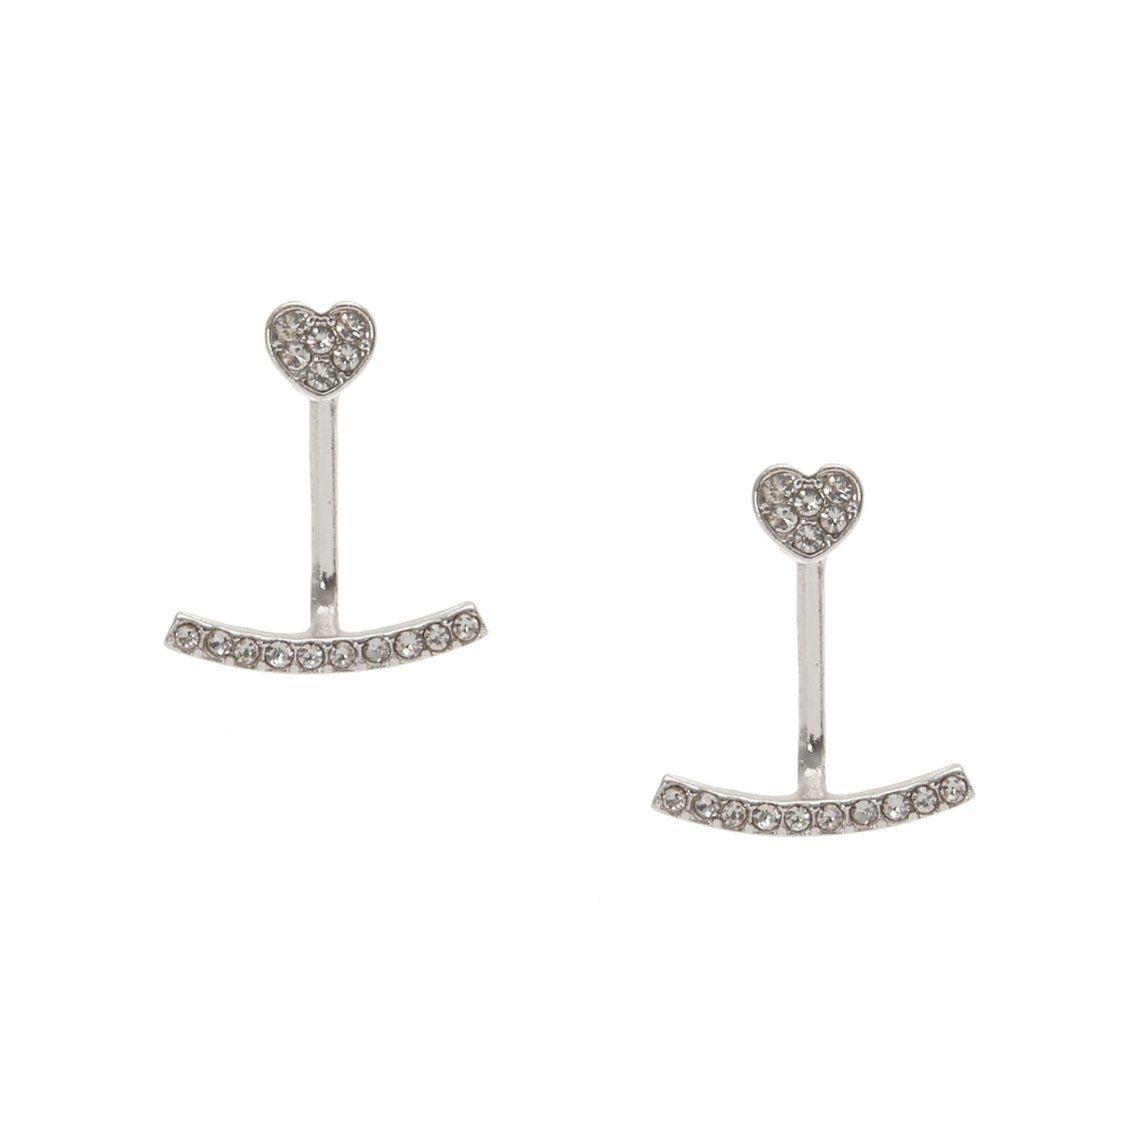 Silver-tone Faux Crystal Heart Front and Back Ear Jacket Earrings ...